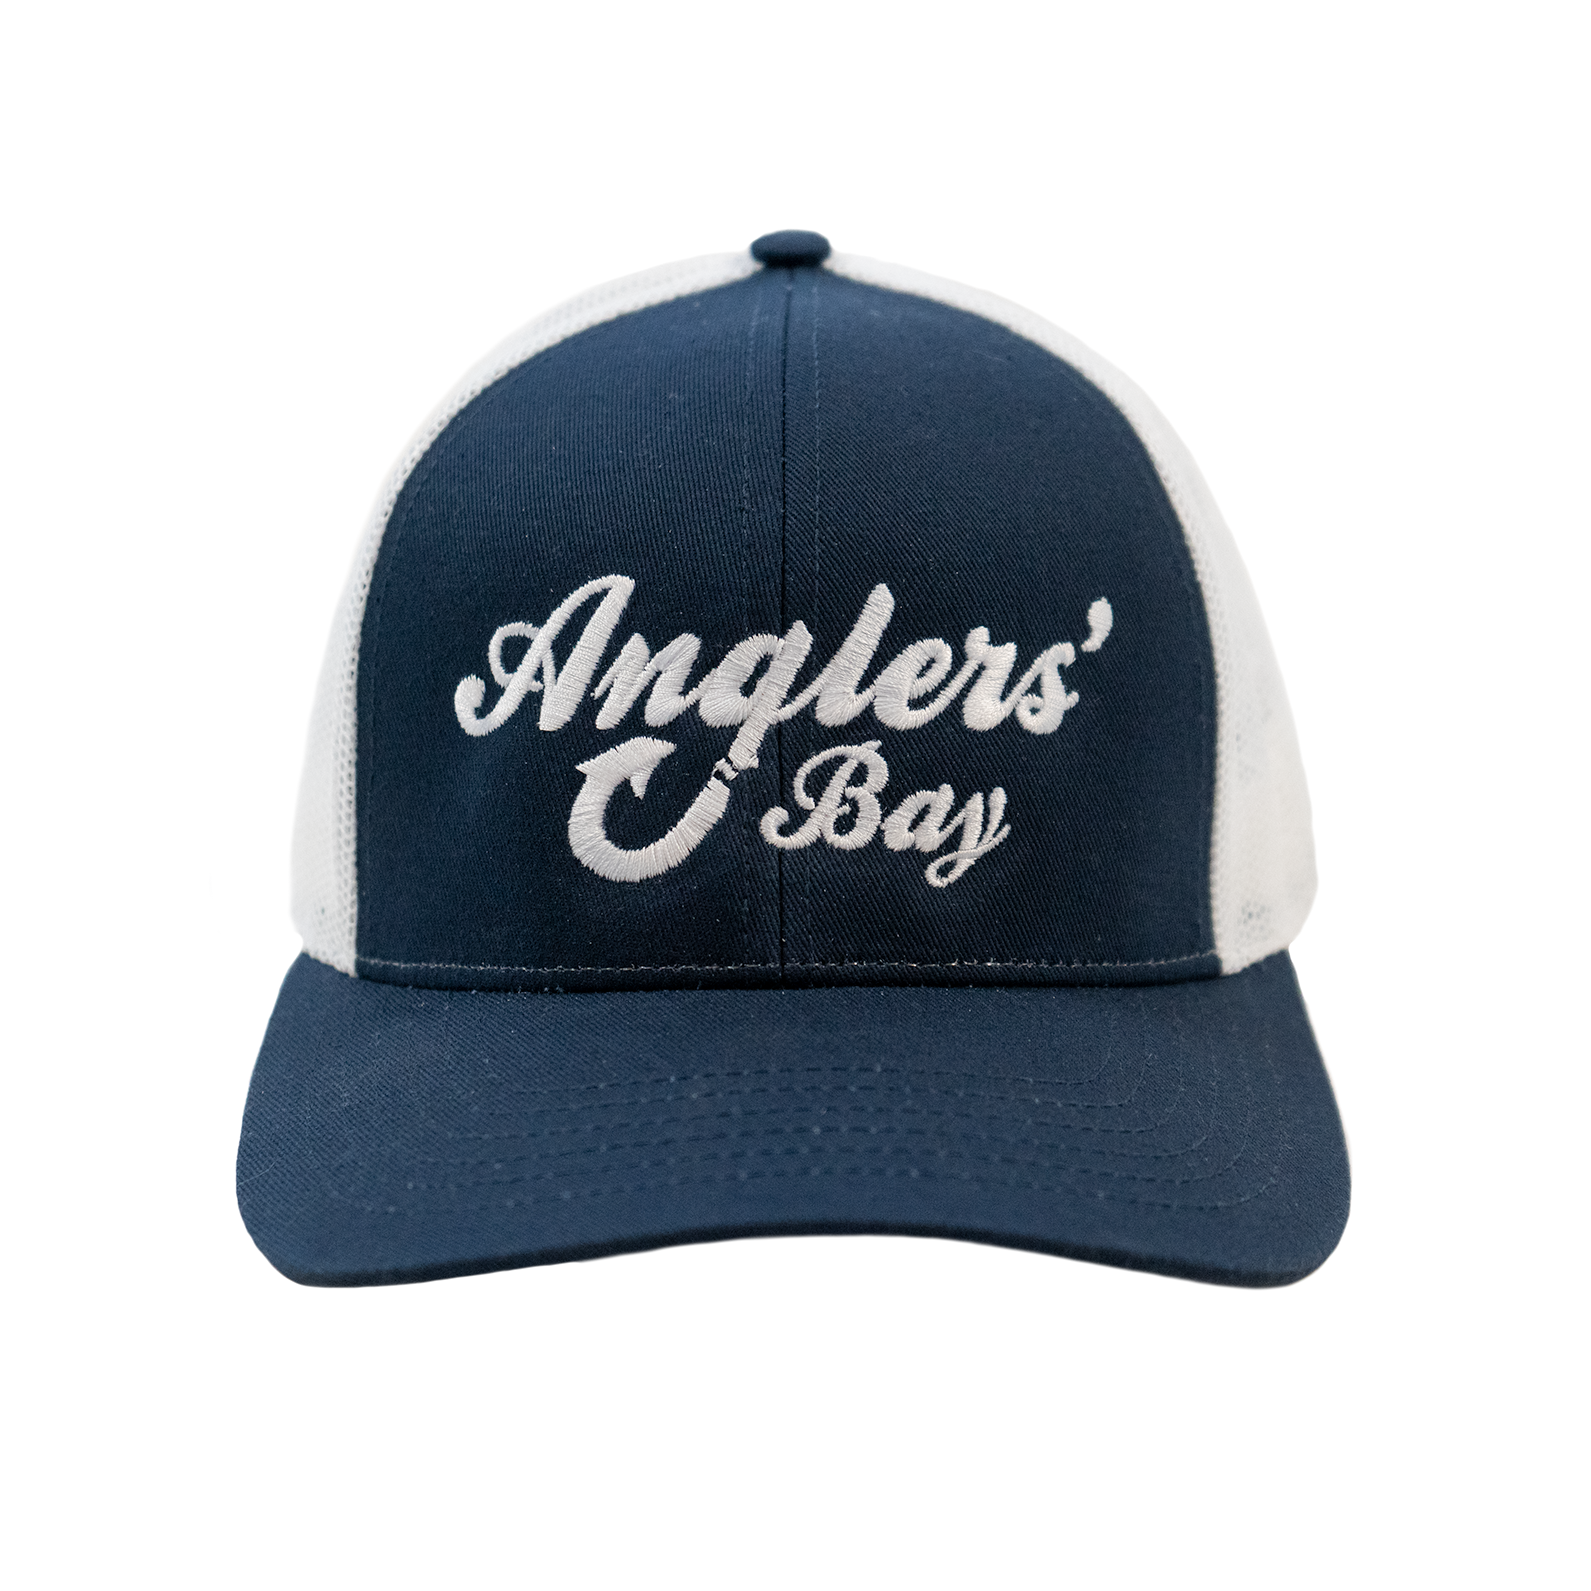 Anglers' Bay Trucker Hat in Navy White